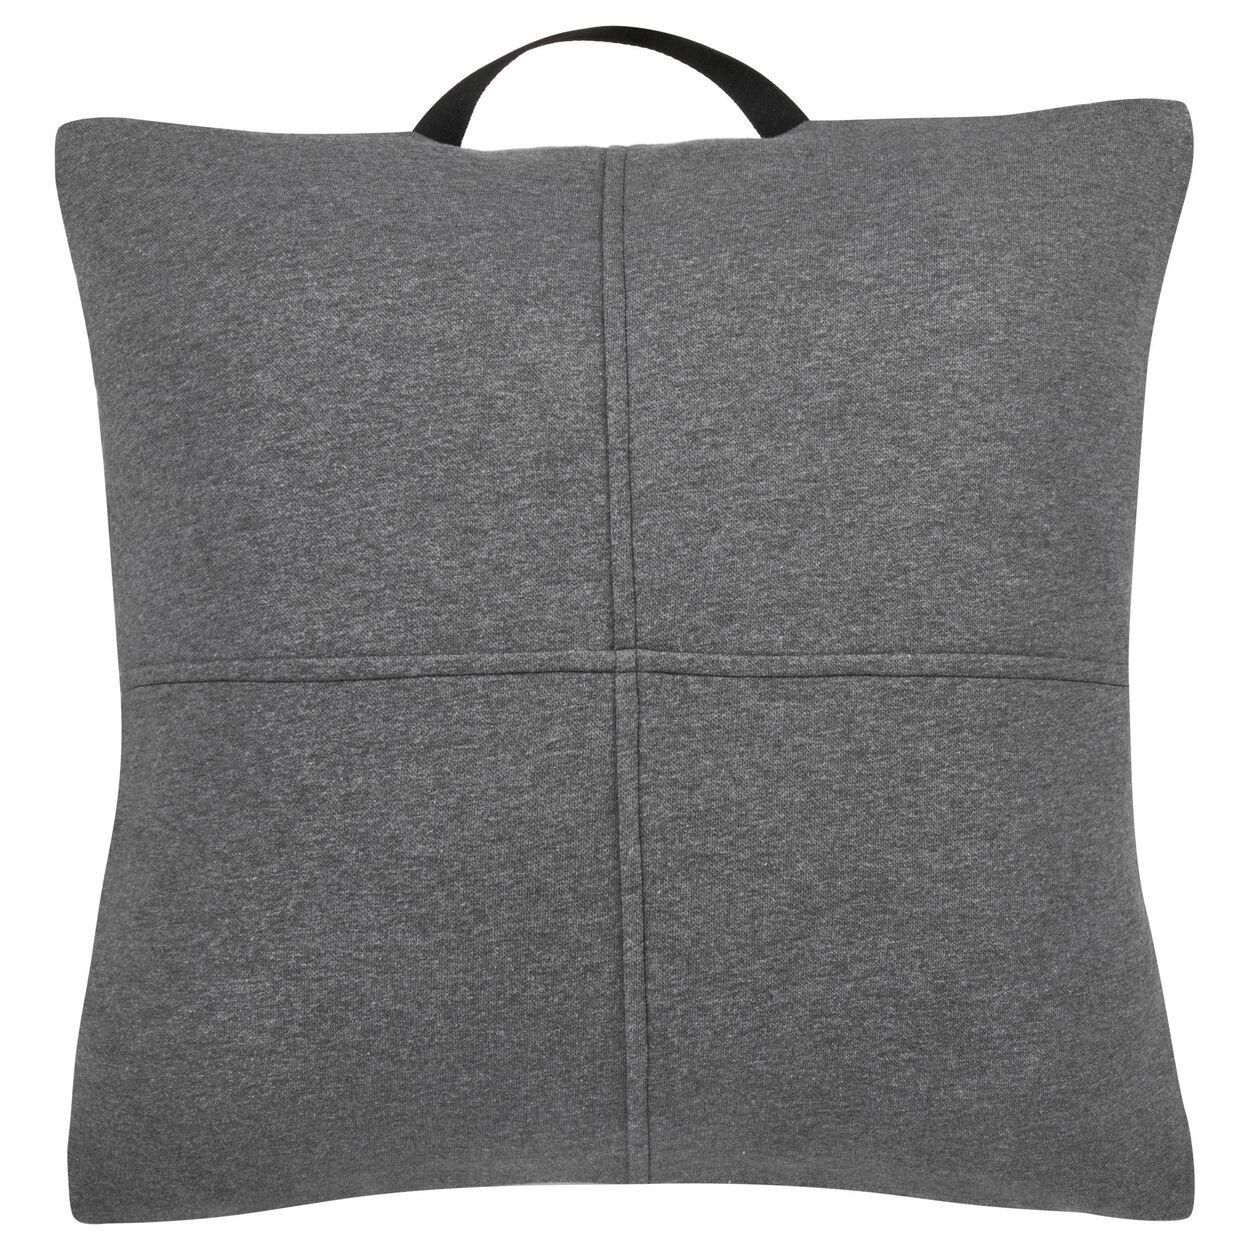 "Alieno Decorative Pillow with Handle 24"" X 24"""